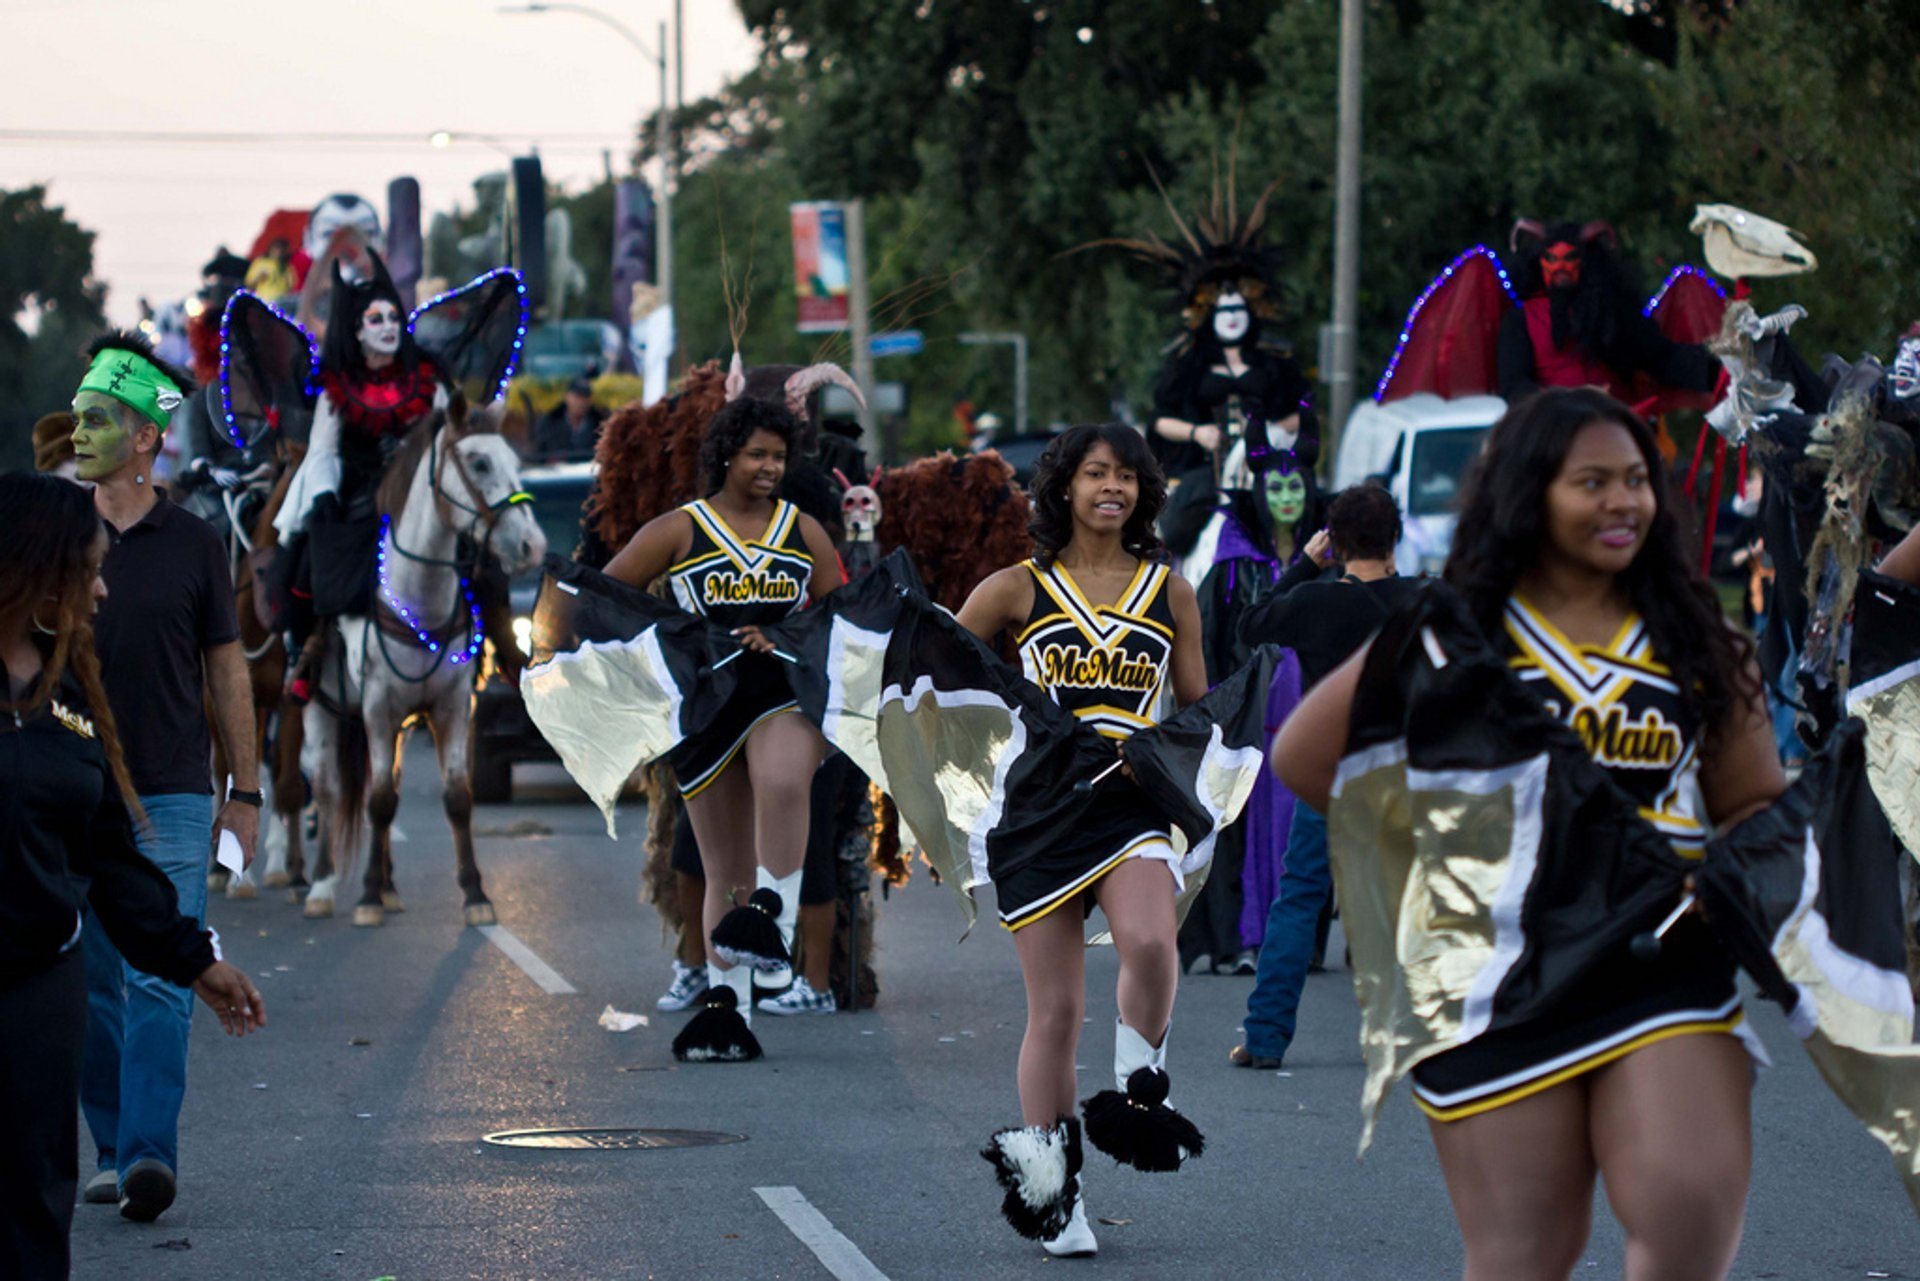 Krewe of Boo Halloween Parade in New Orleans - Best Season